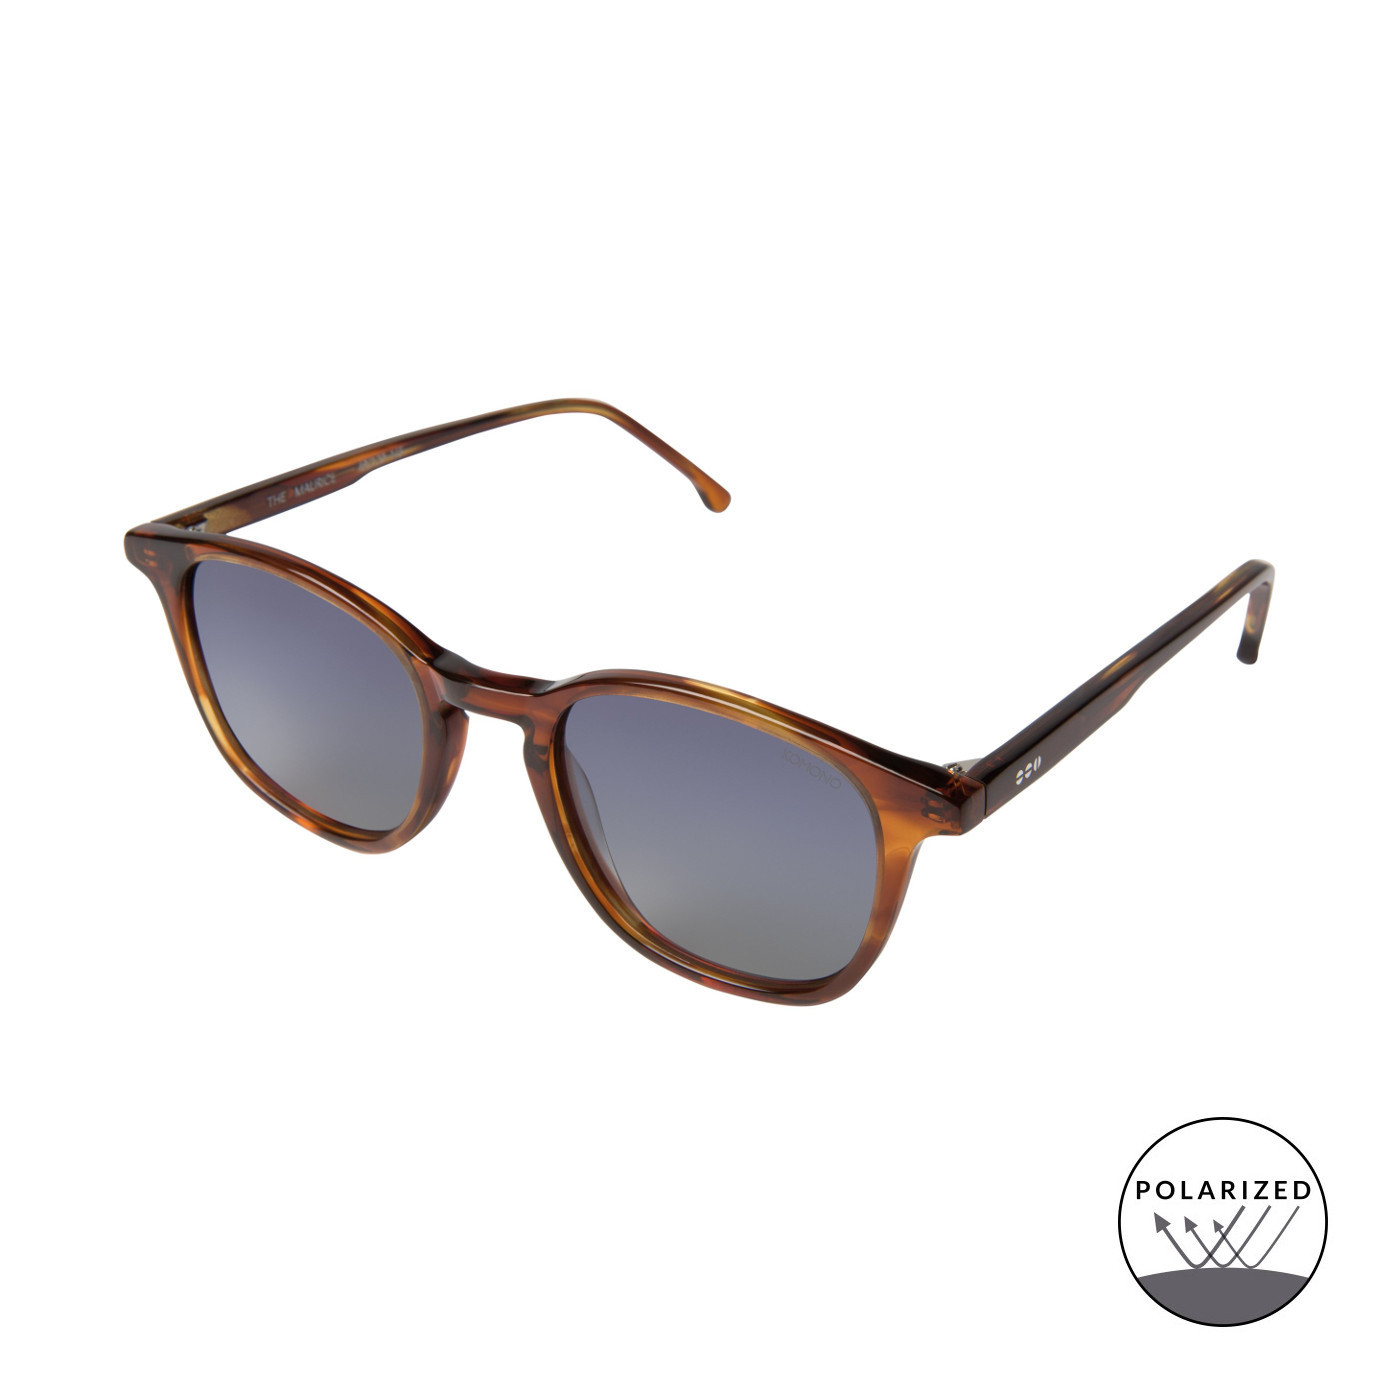 2d00f1b798 Komono Maurice Bourbon Gafas de Sol Polarizadas KOM-S4151 - Gafas de sol